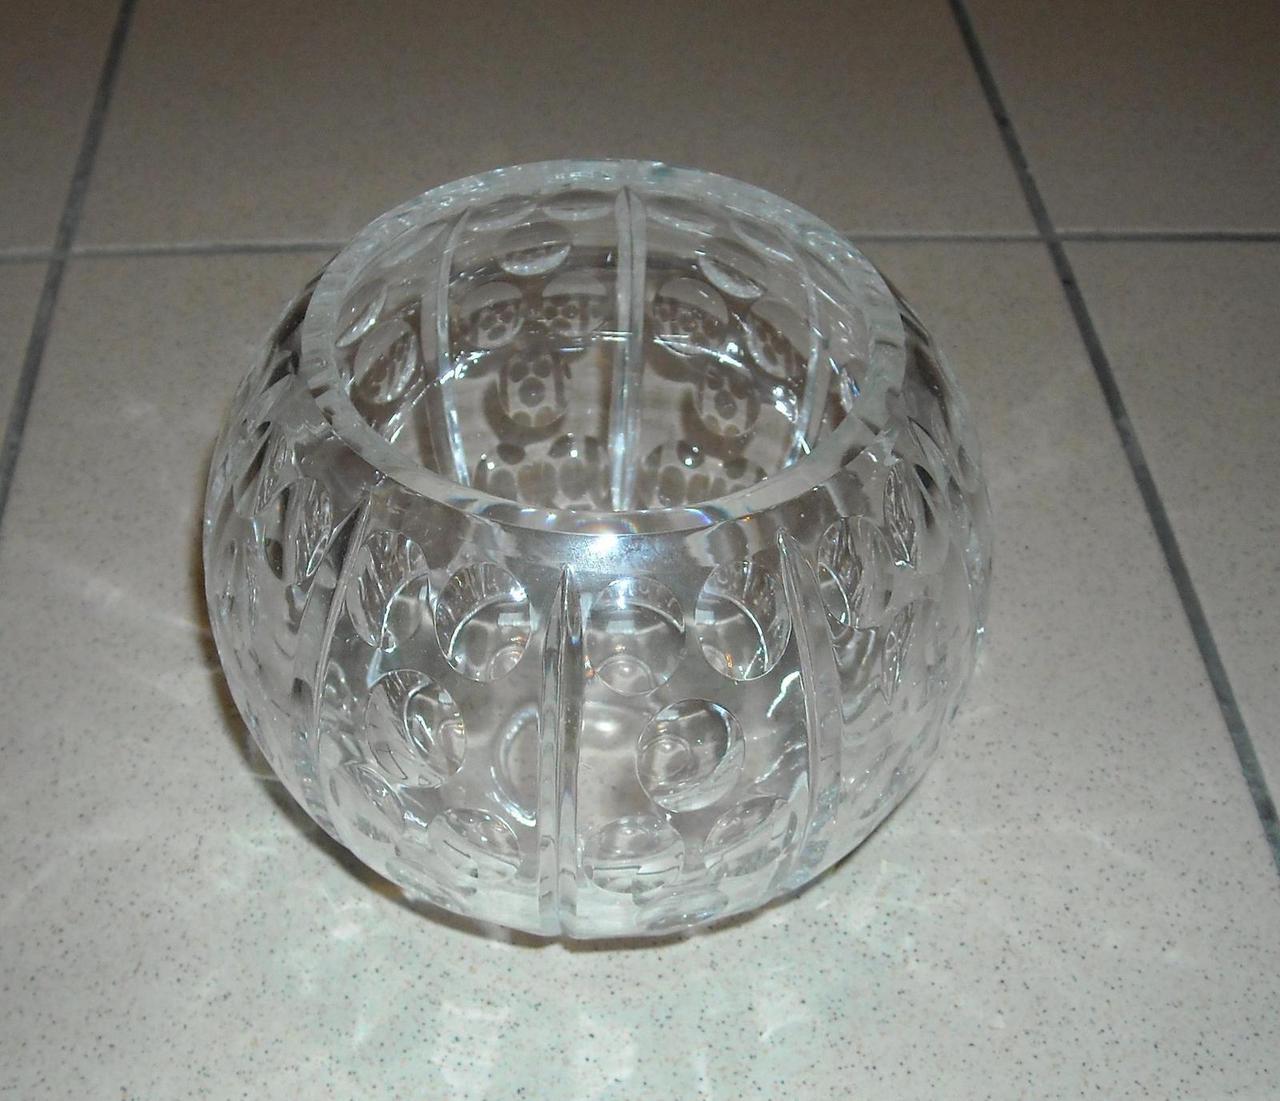 lampenschirm aus glas glasschirm k0127x1 ca 15 cm. Black Bedroom Furniture Sets. Home Design Ideas